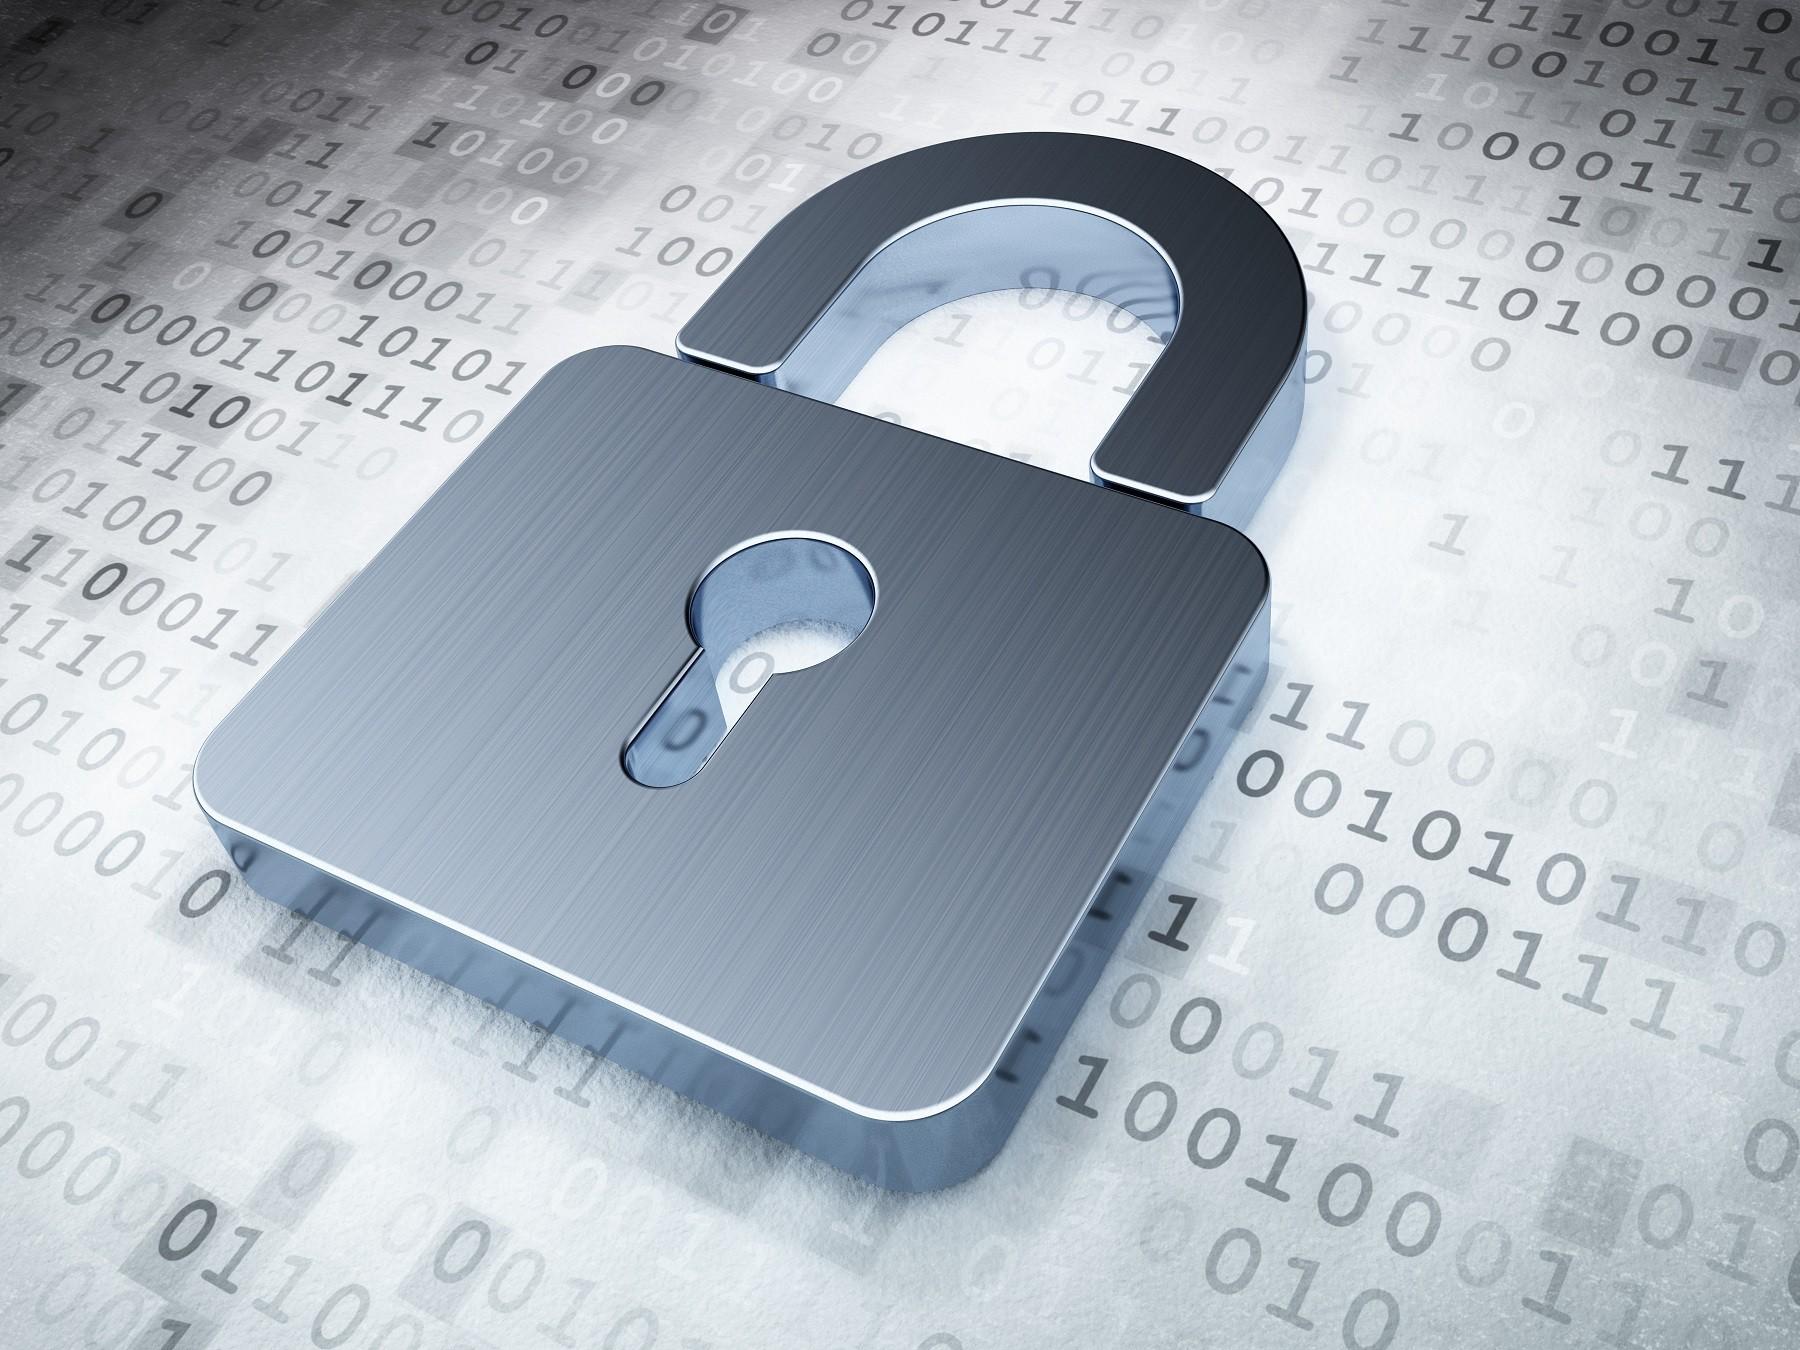 A Guide to Data Privacy & Encryption Portability TechNative